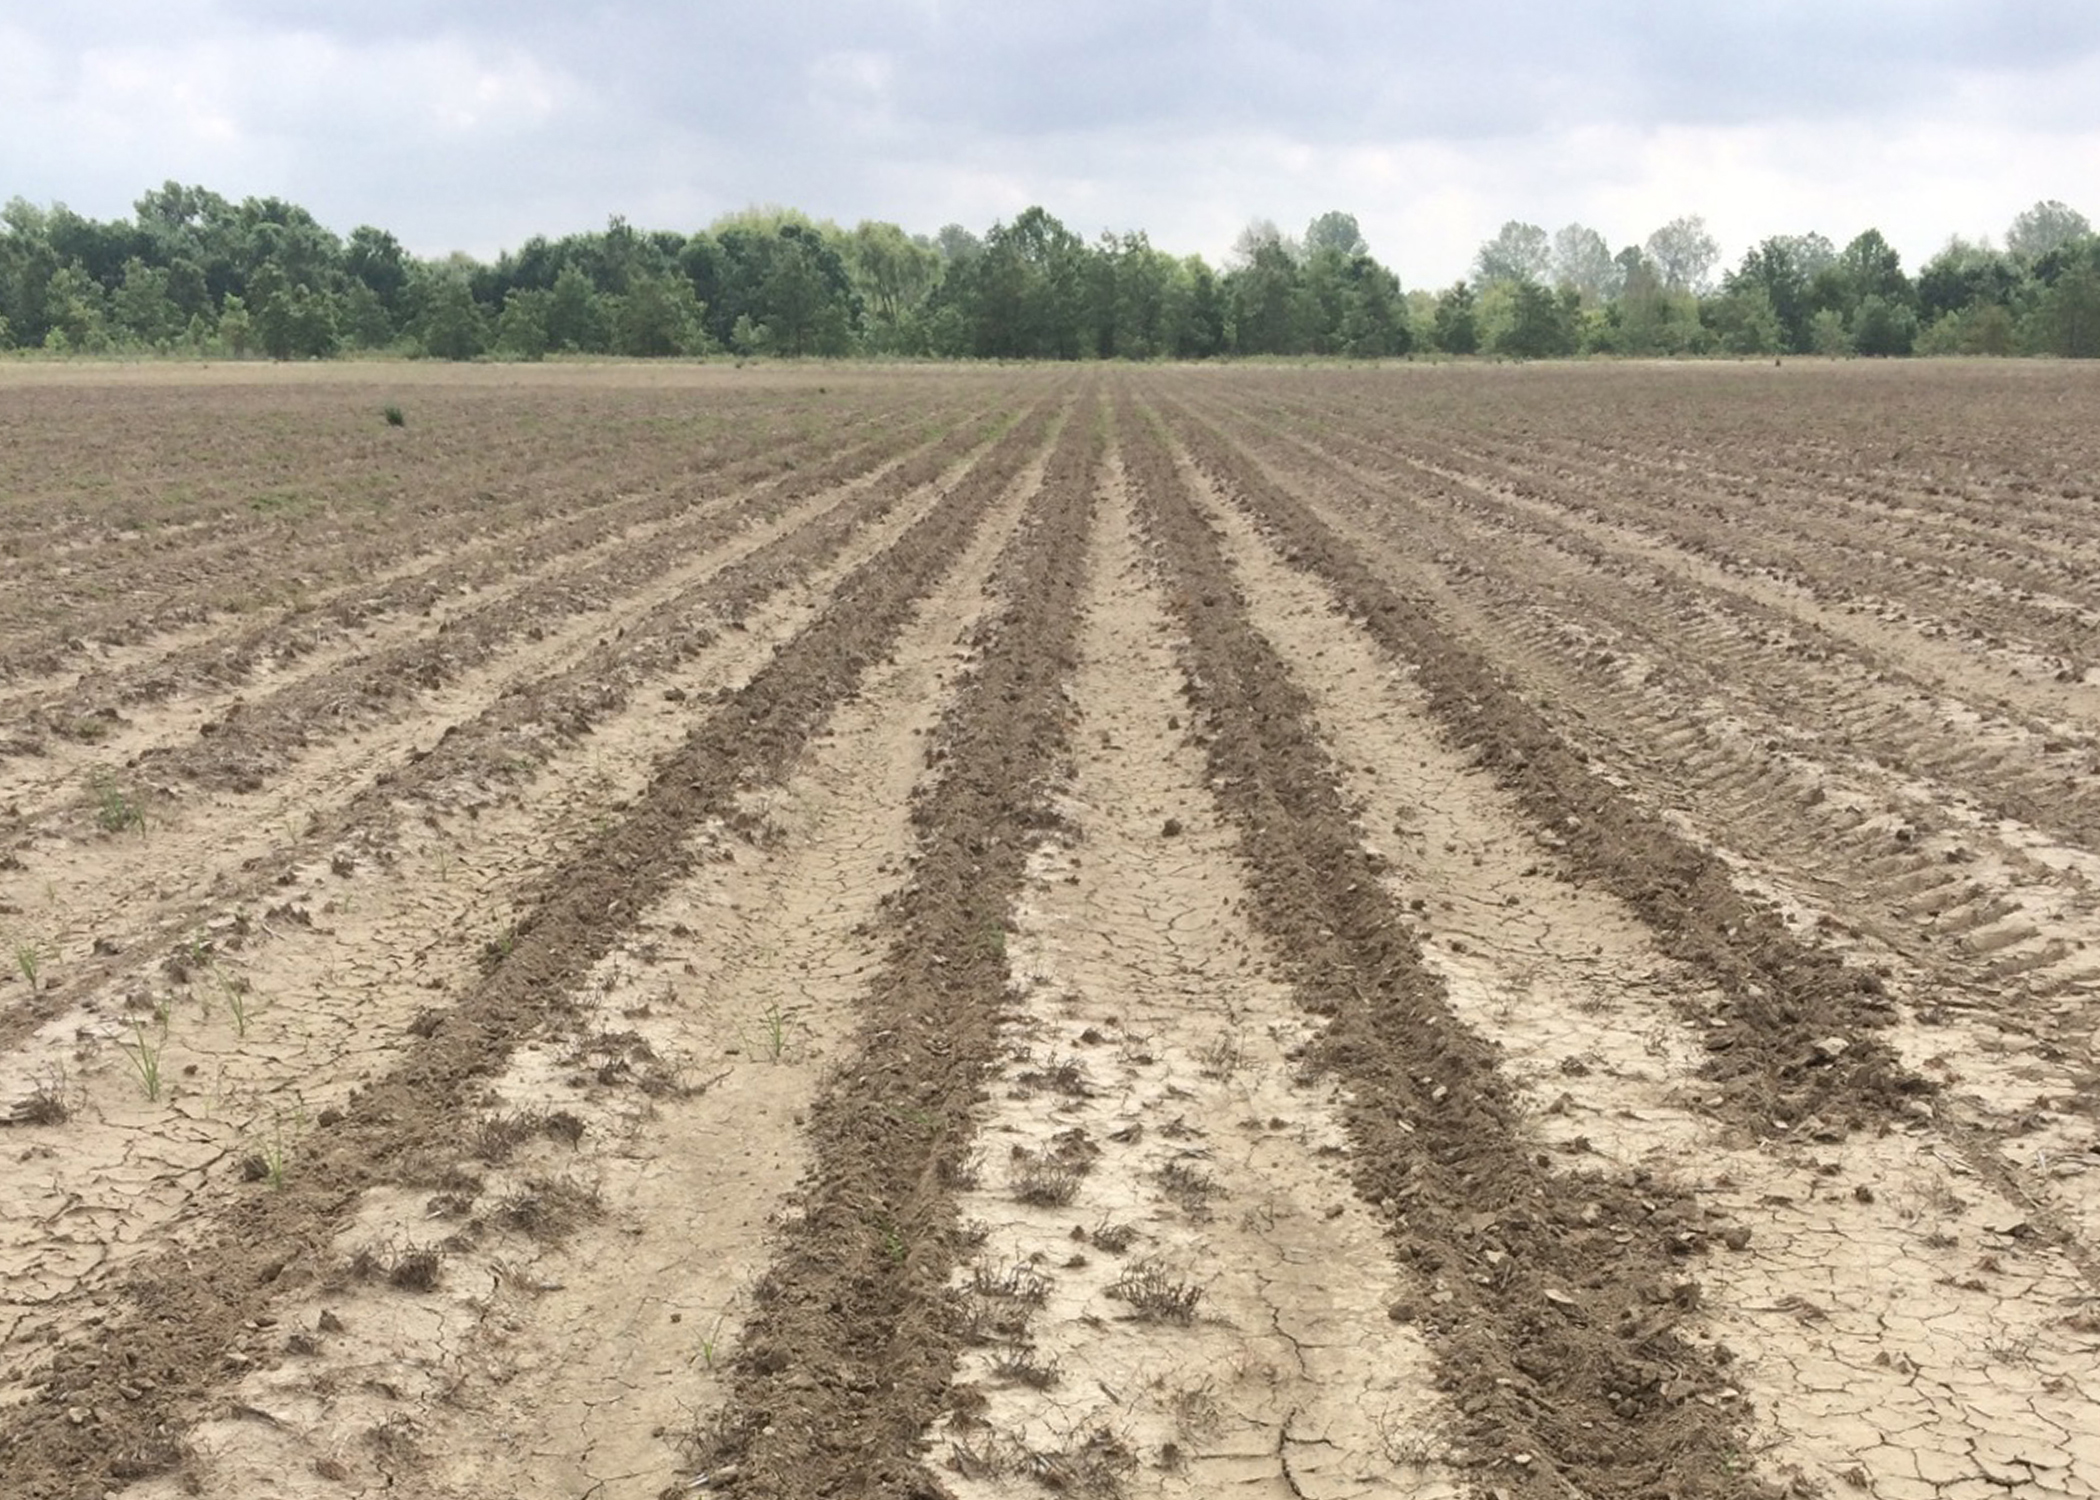 Wild Hogs Behavior Hurts Land They Roam Mississippi